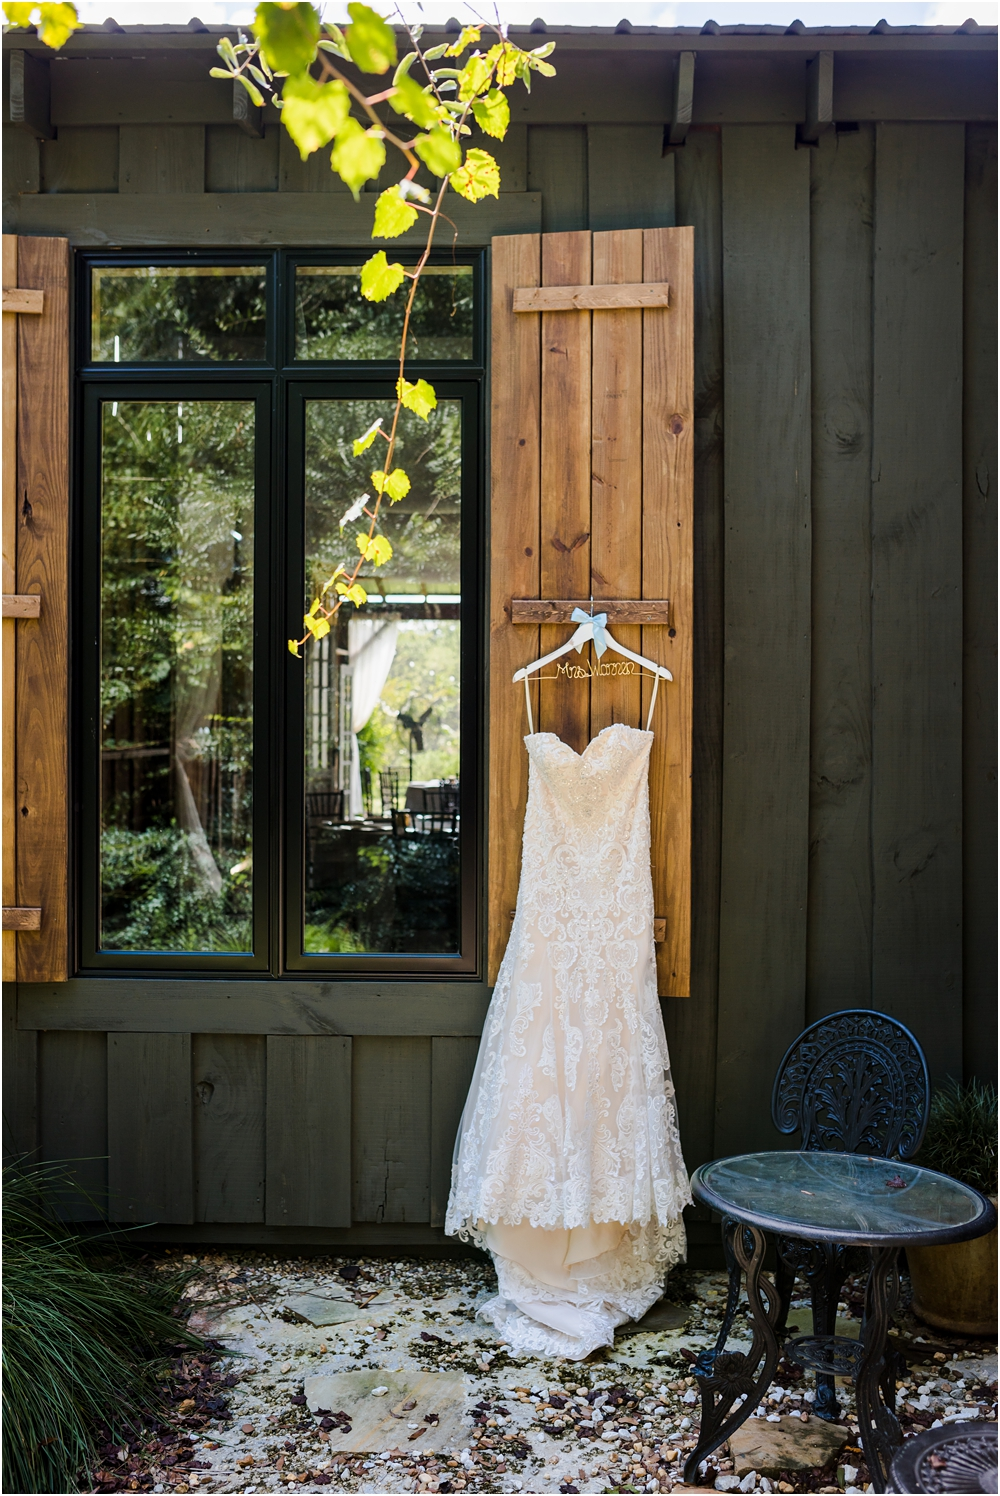 matthew-wedding-kiersten-stevenson-photography-30a-panama-city-beach-dothan-tallahassee-(3-of-579).JPG